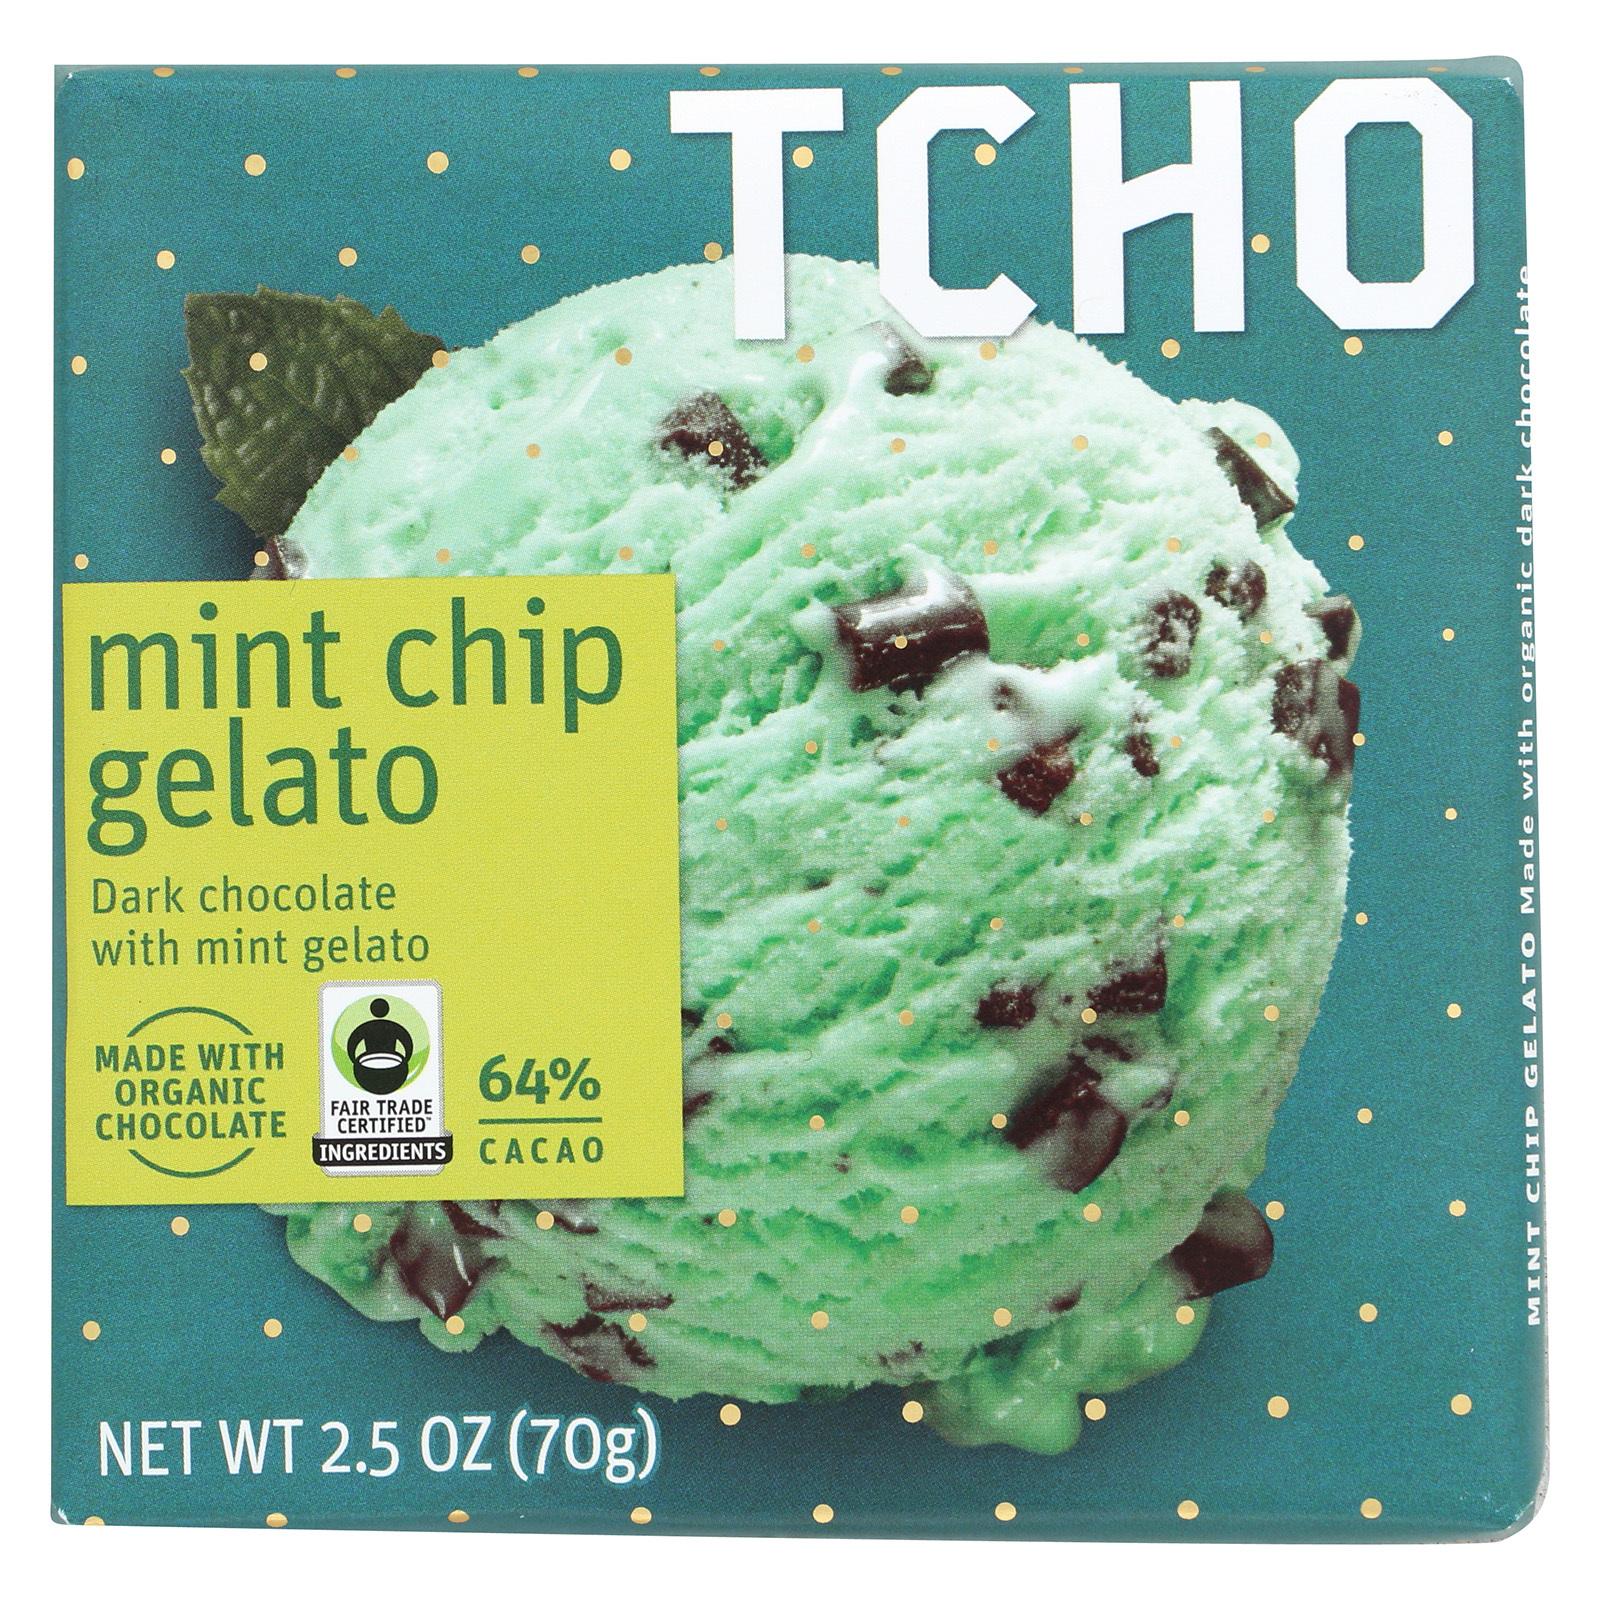 Tcho Chocolate Dark Chocolate Bar - Mint Chip Gelato 64 Percent Cacao - Case of 12 - 2.5 oz.